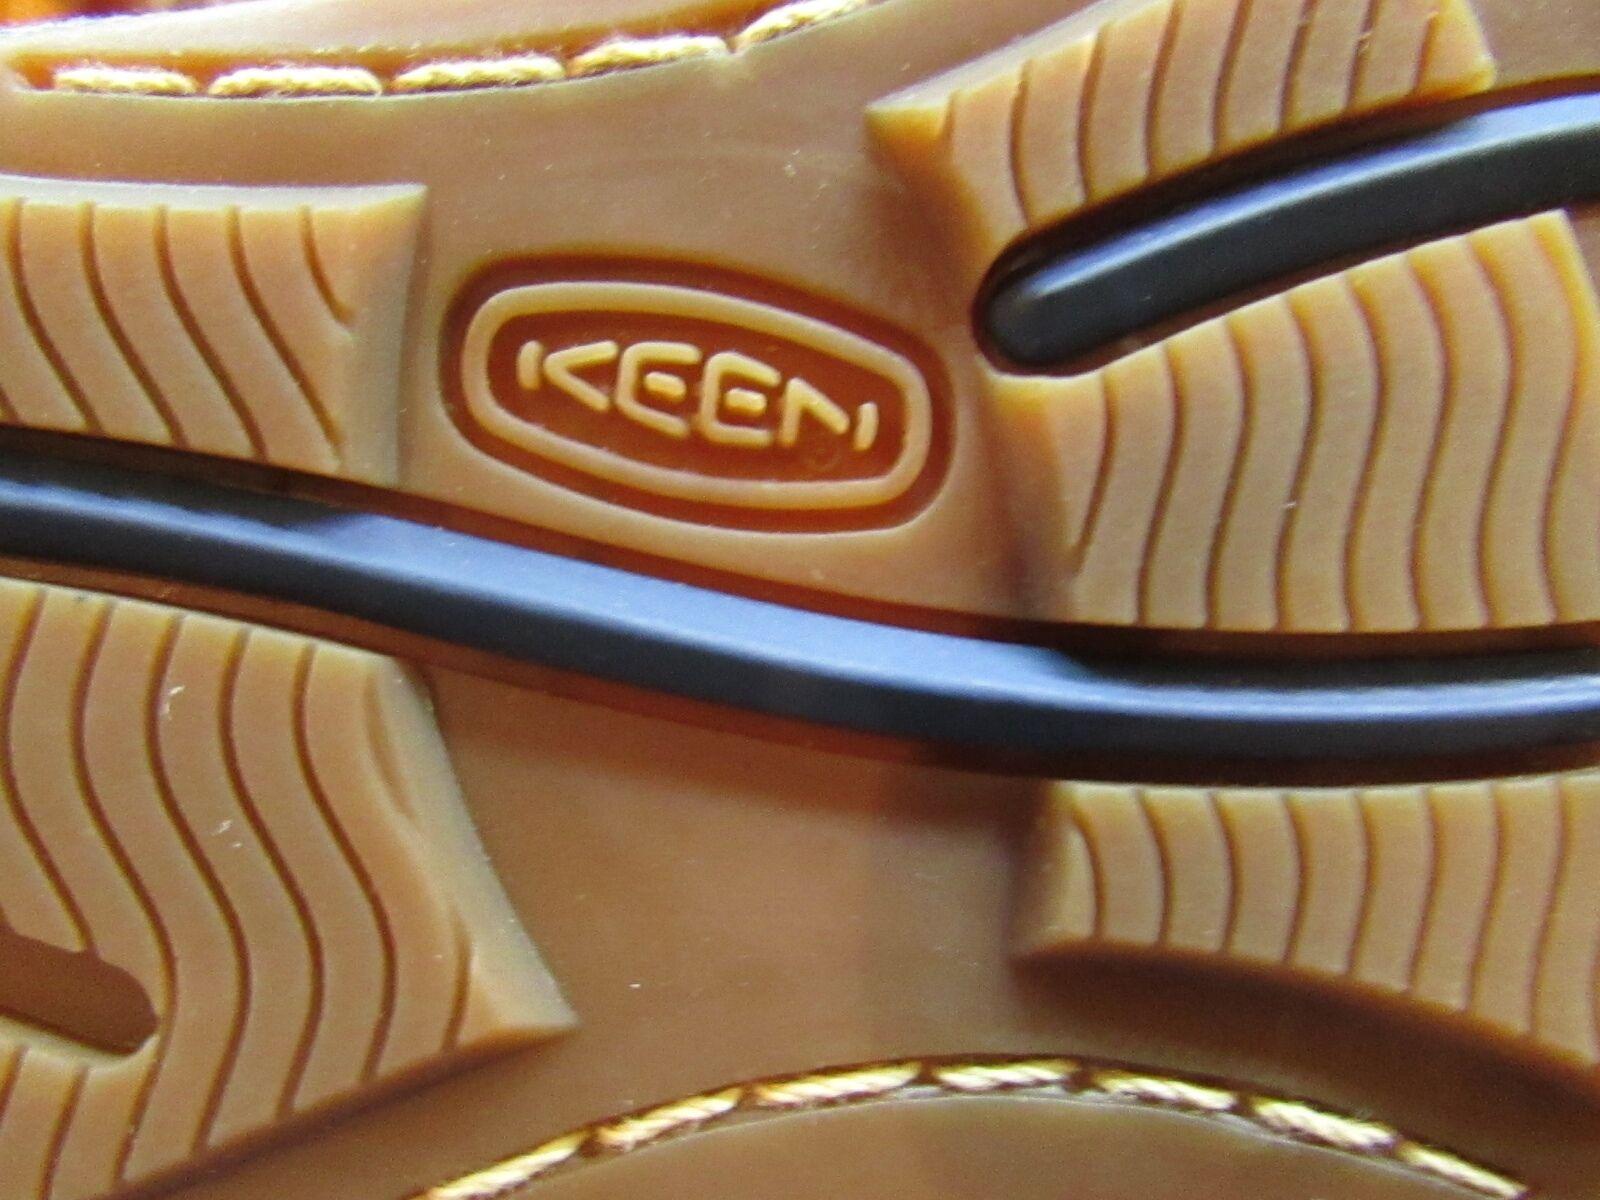 NEW KEEN CATALINA CANVAS BOAT Schuhe Damenschuhe 8 8 Damenschuhe ENSIGN Blau FREE SHIP 205ec2